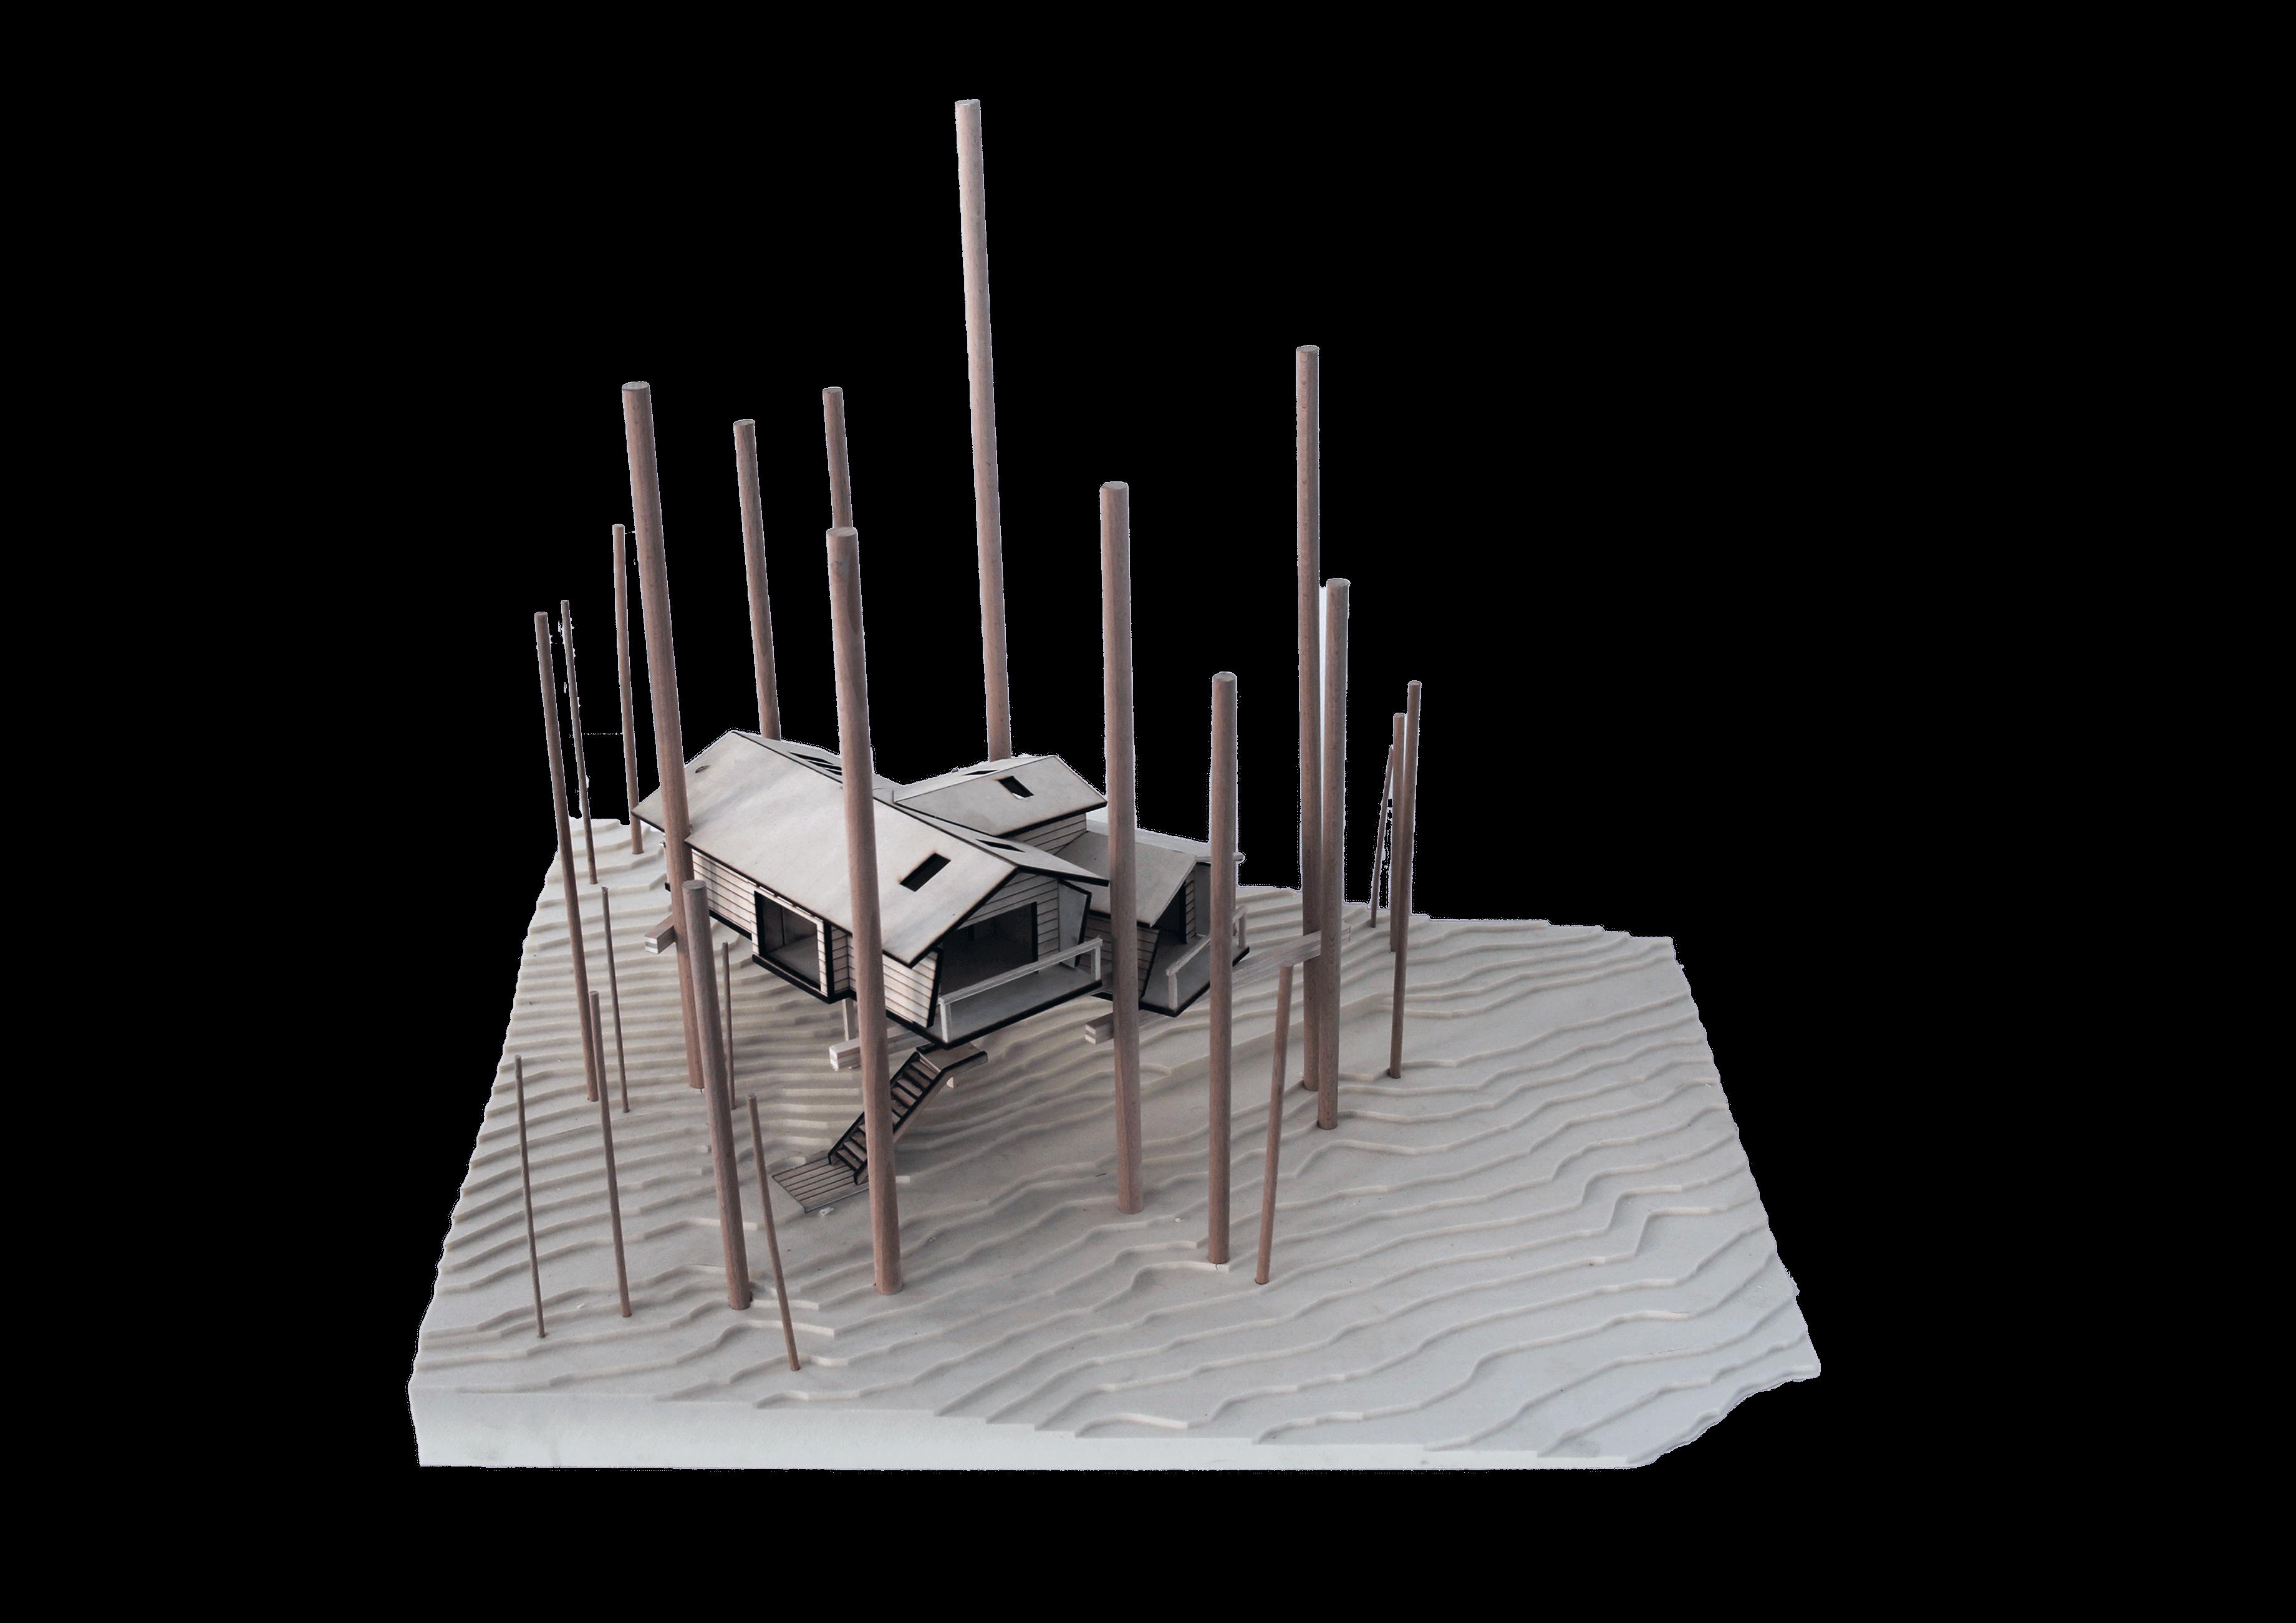 https://fsw-kreatektur.ch/wp-content/uploads/Fsw-Kreatektur-Architektur-Modellbau-Baumhaus.png